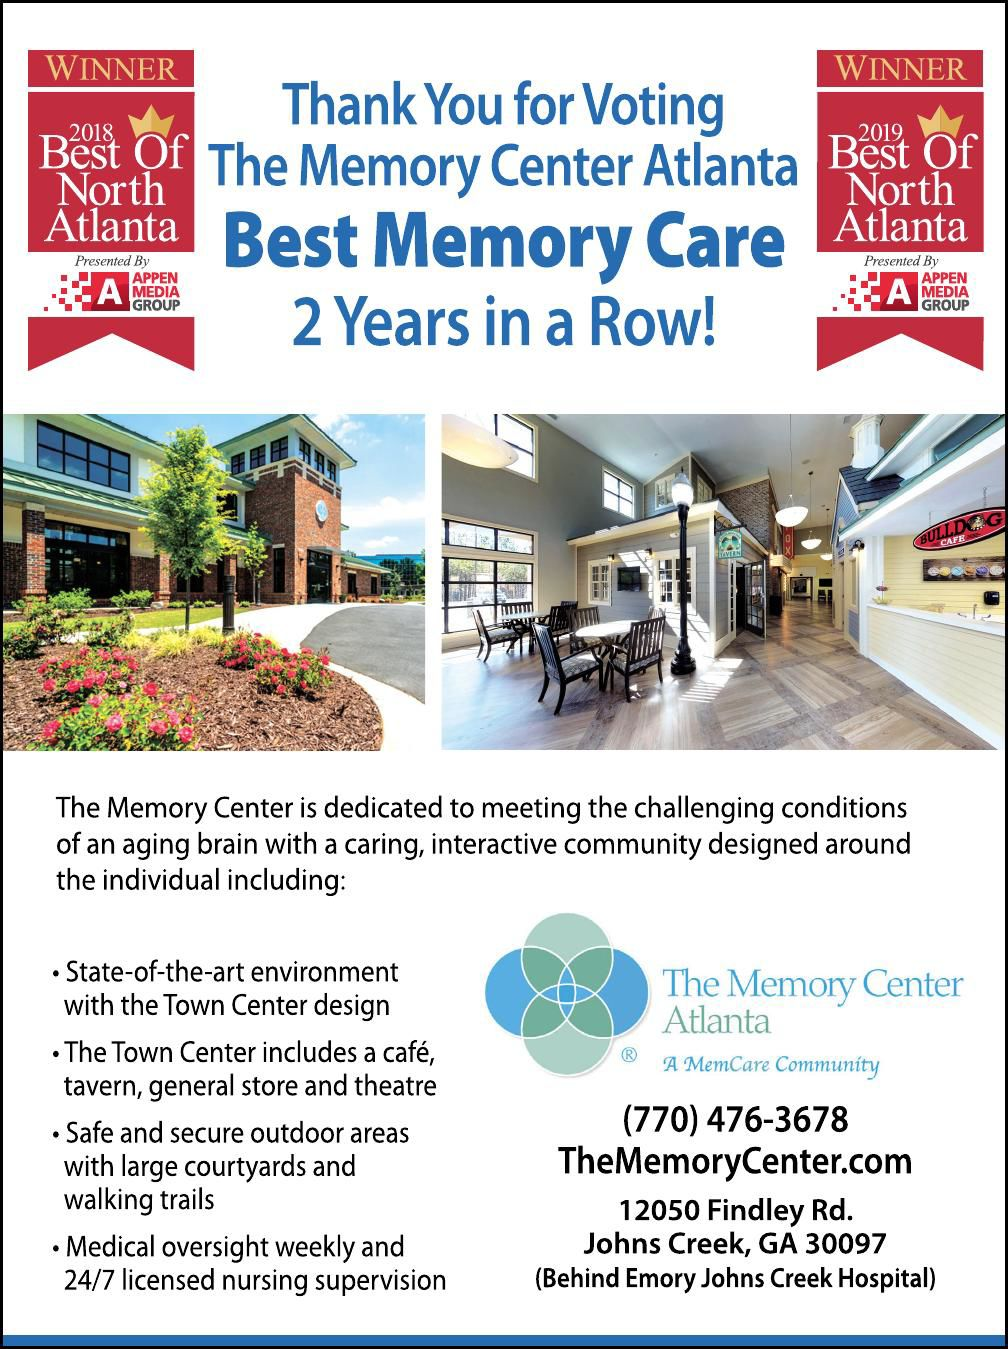 Memory Center Atlanta